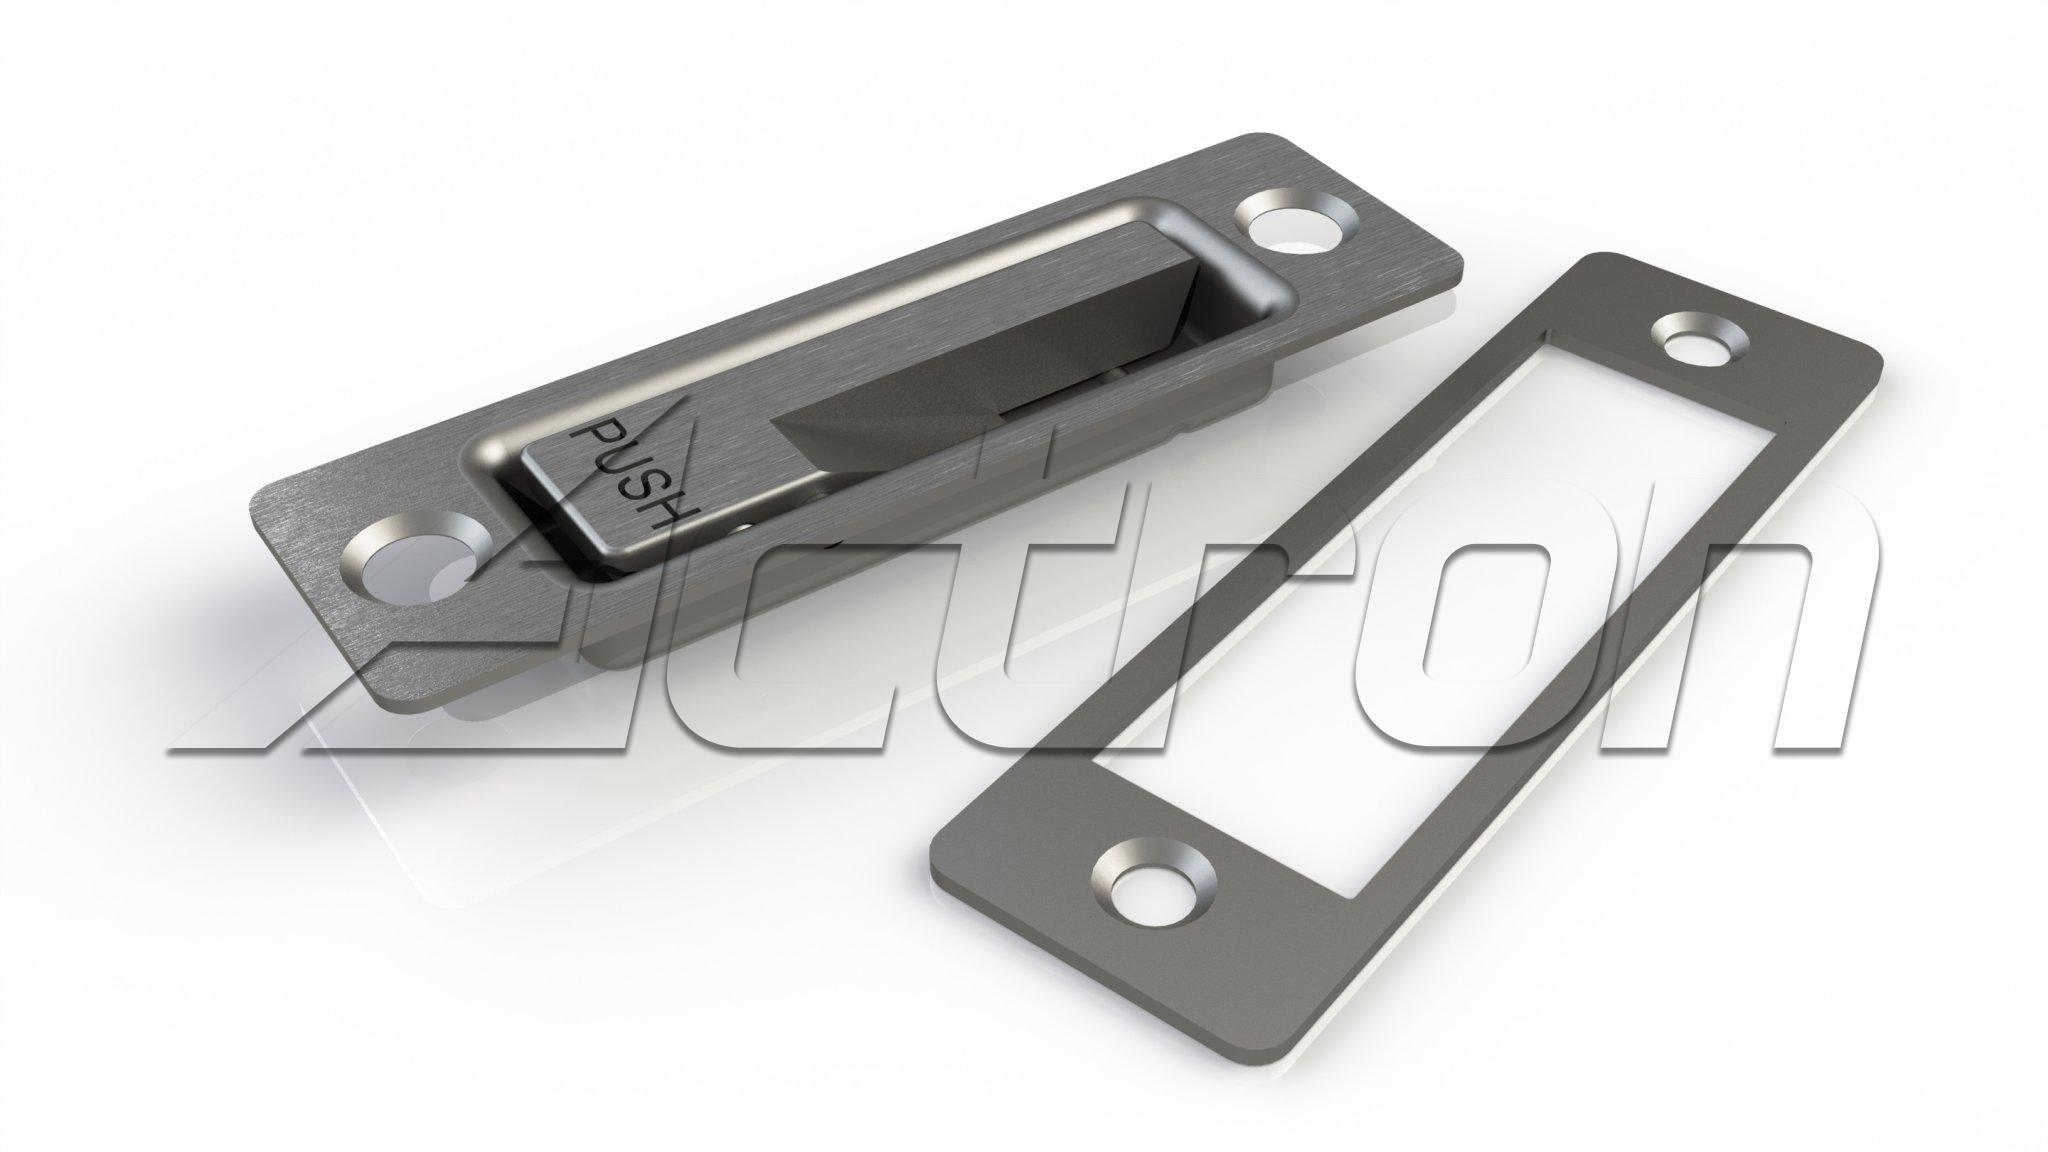 latch-assy-8211-retainer-4725-a35012.jpg